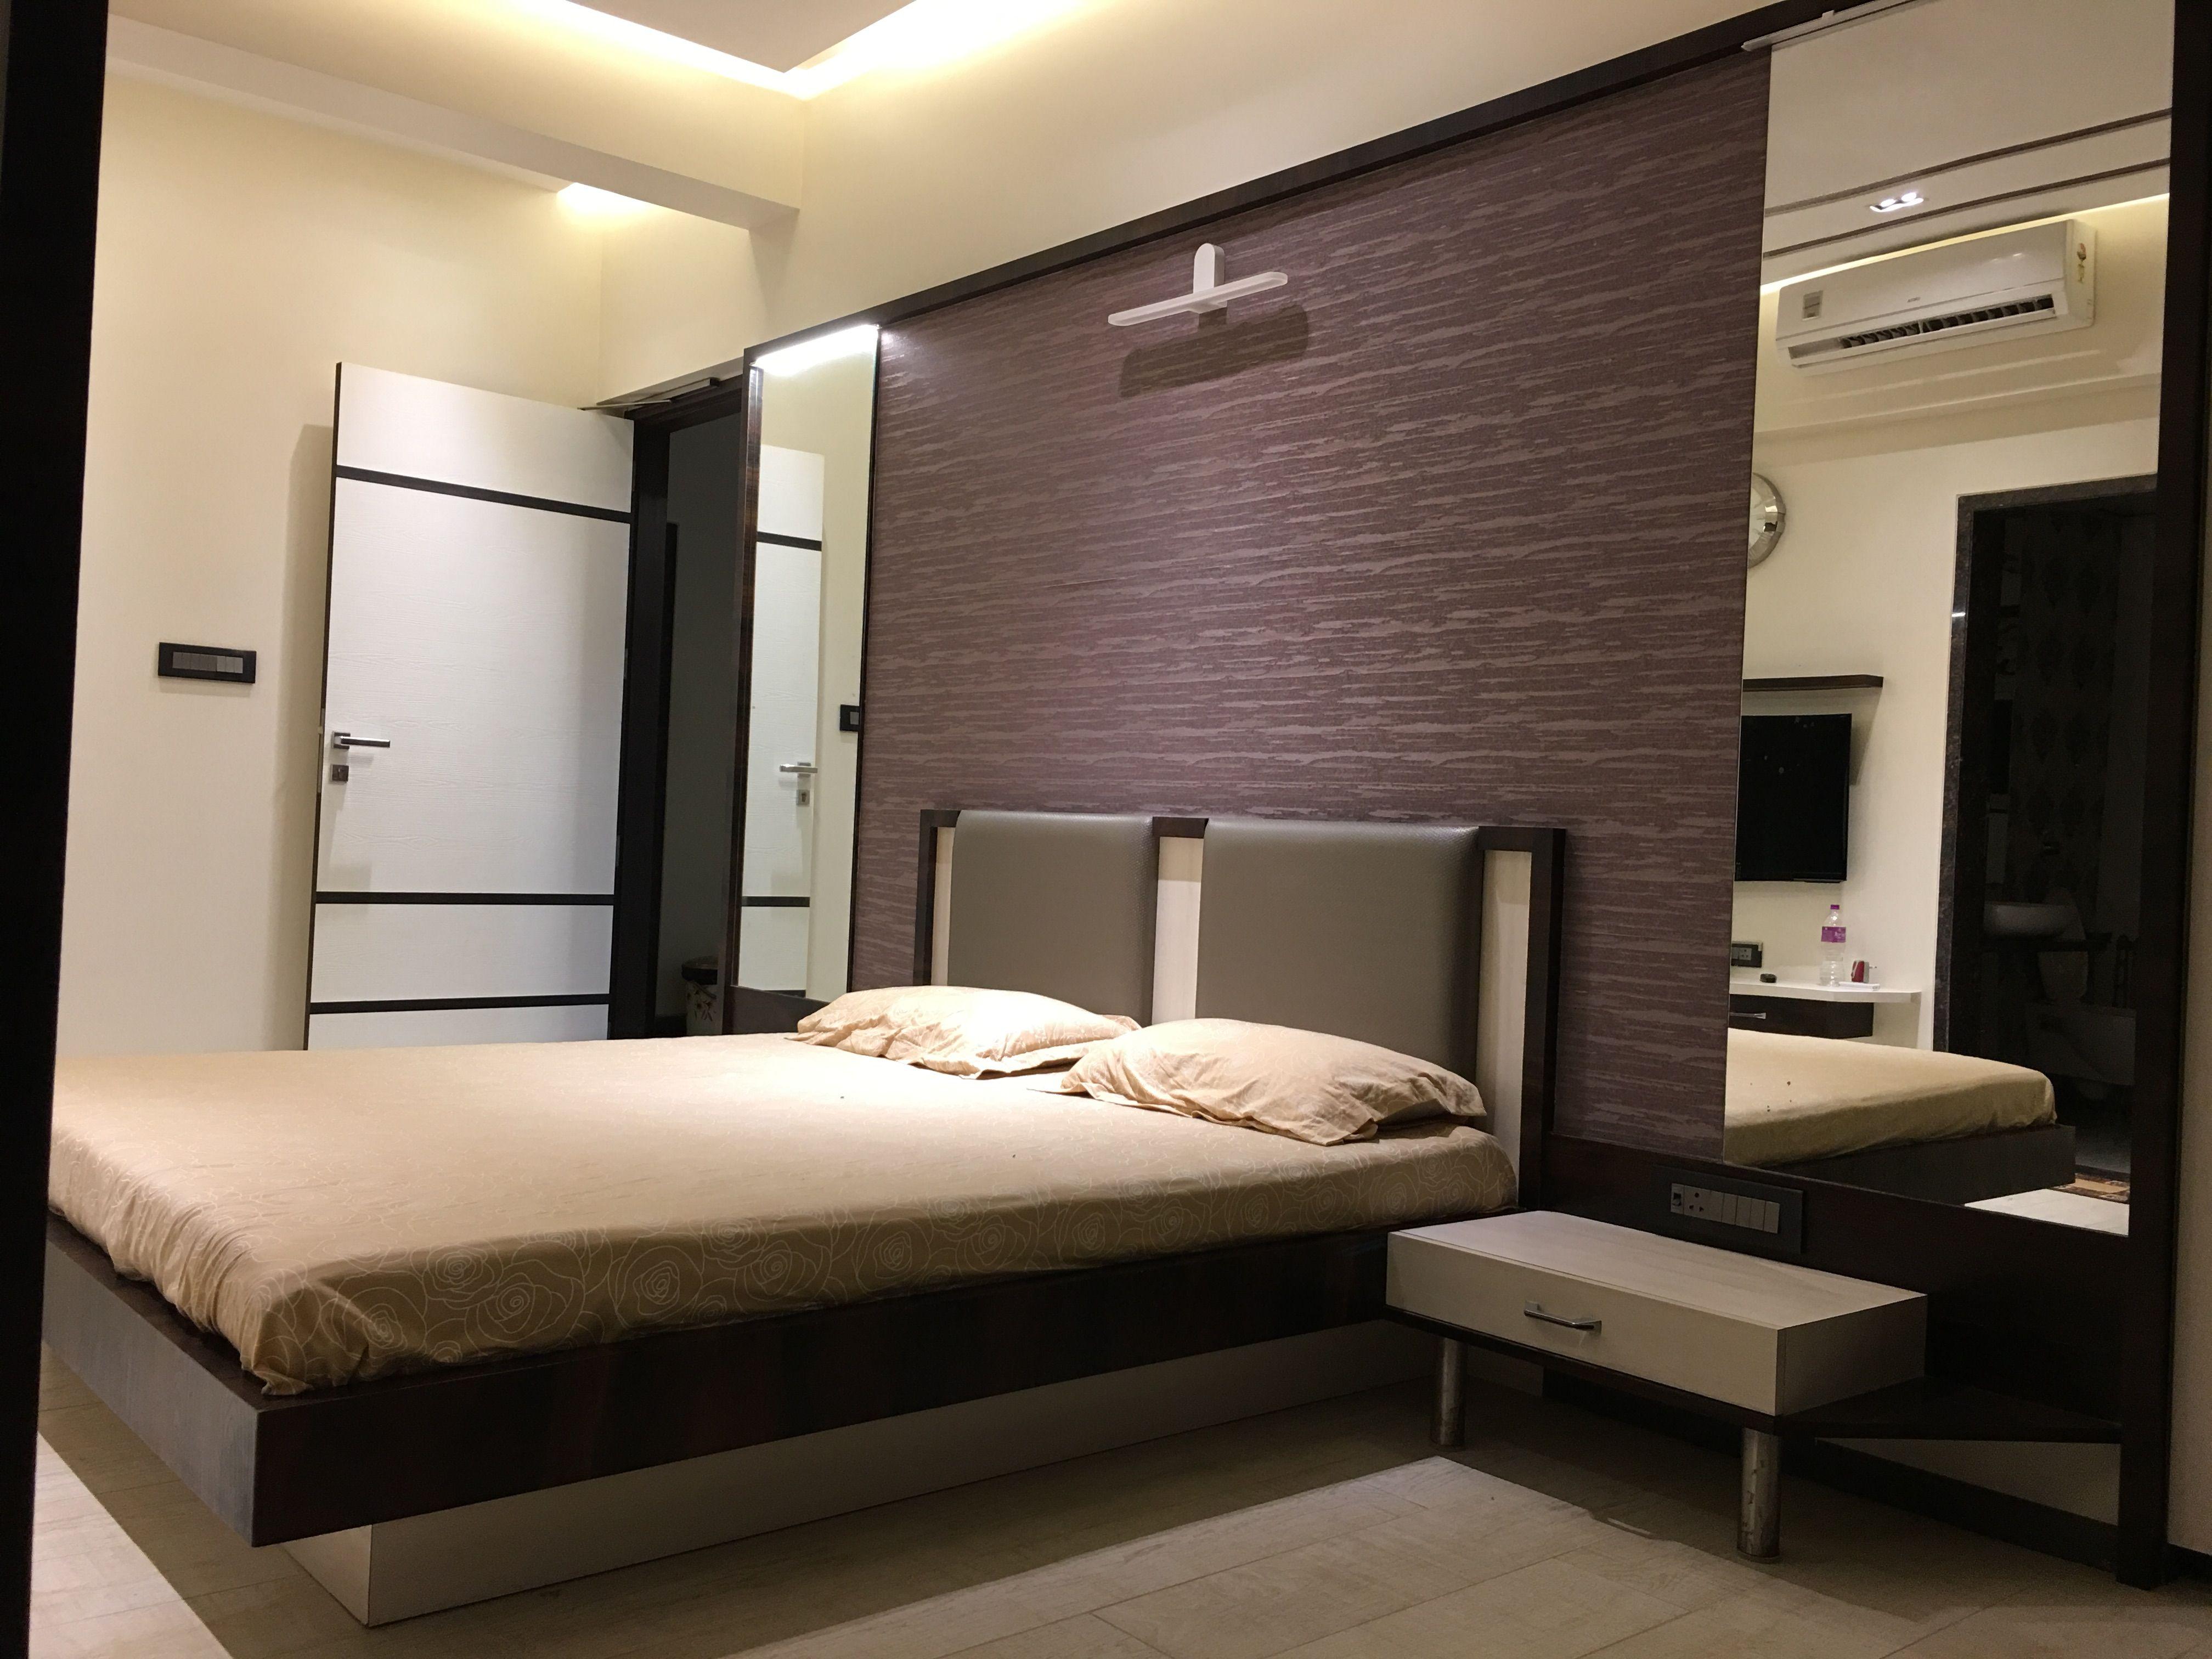 Best Bedroom Bed Wallpaper Ceiling Villa Rustic Modern Contempoarary Bed Back Design Bedroom Bed 640 x 480